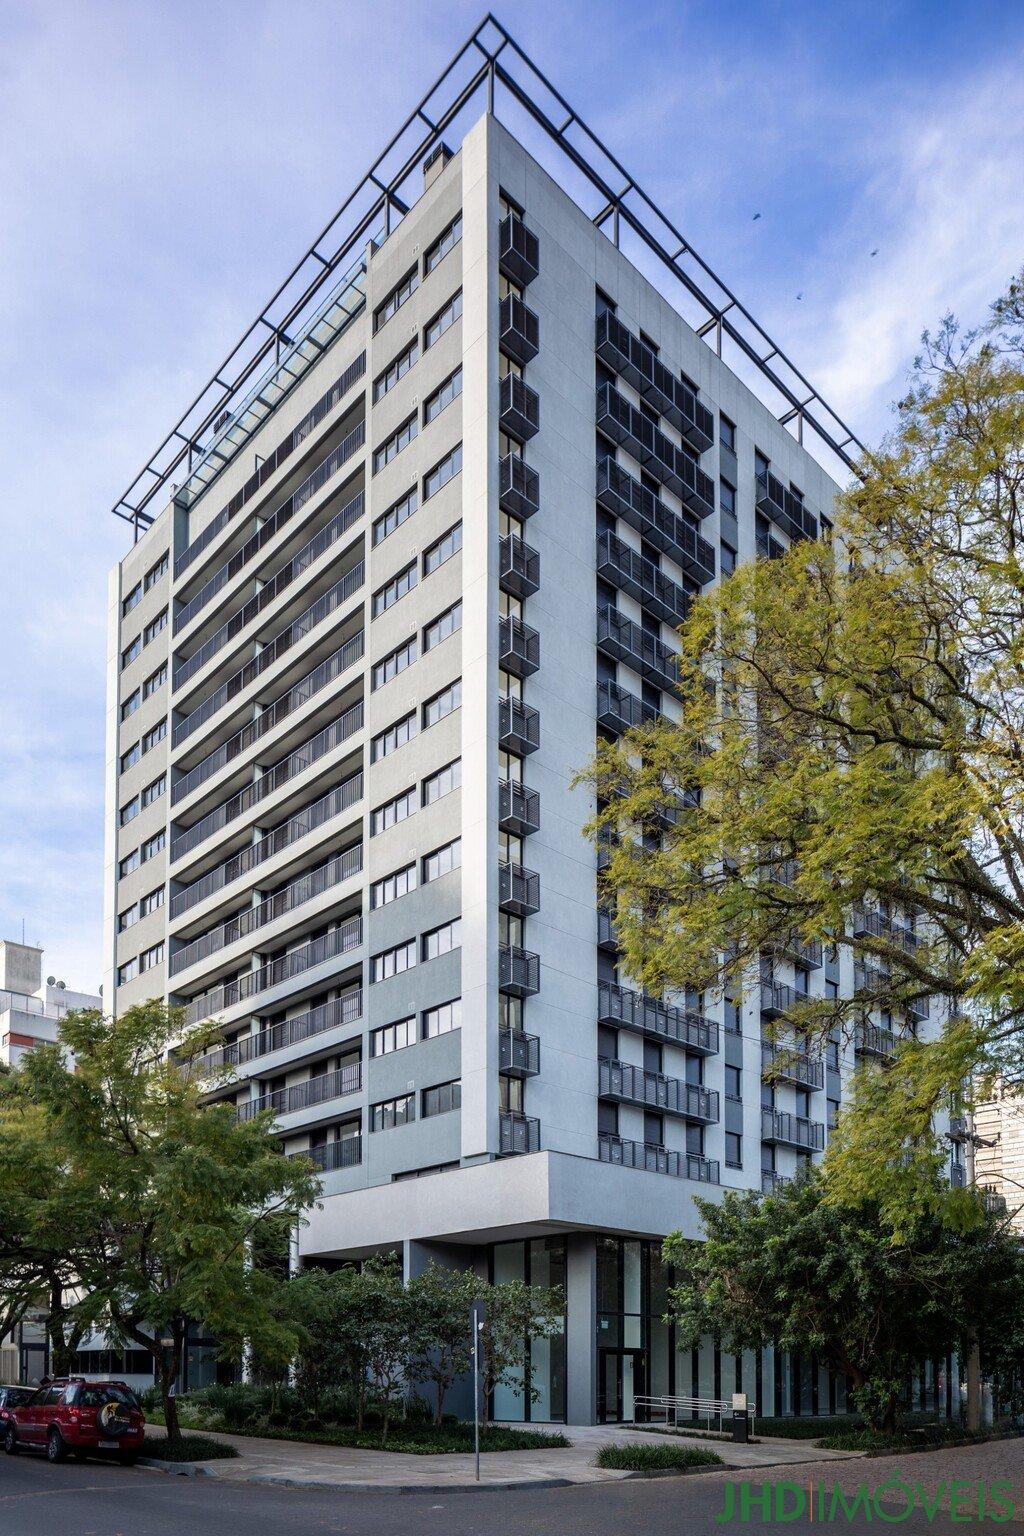 Ny 205 Apartamento Auxiliadora, Porto Alegre (9731)